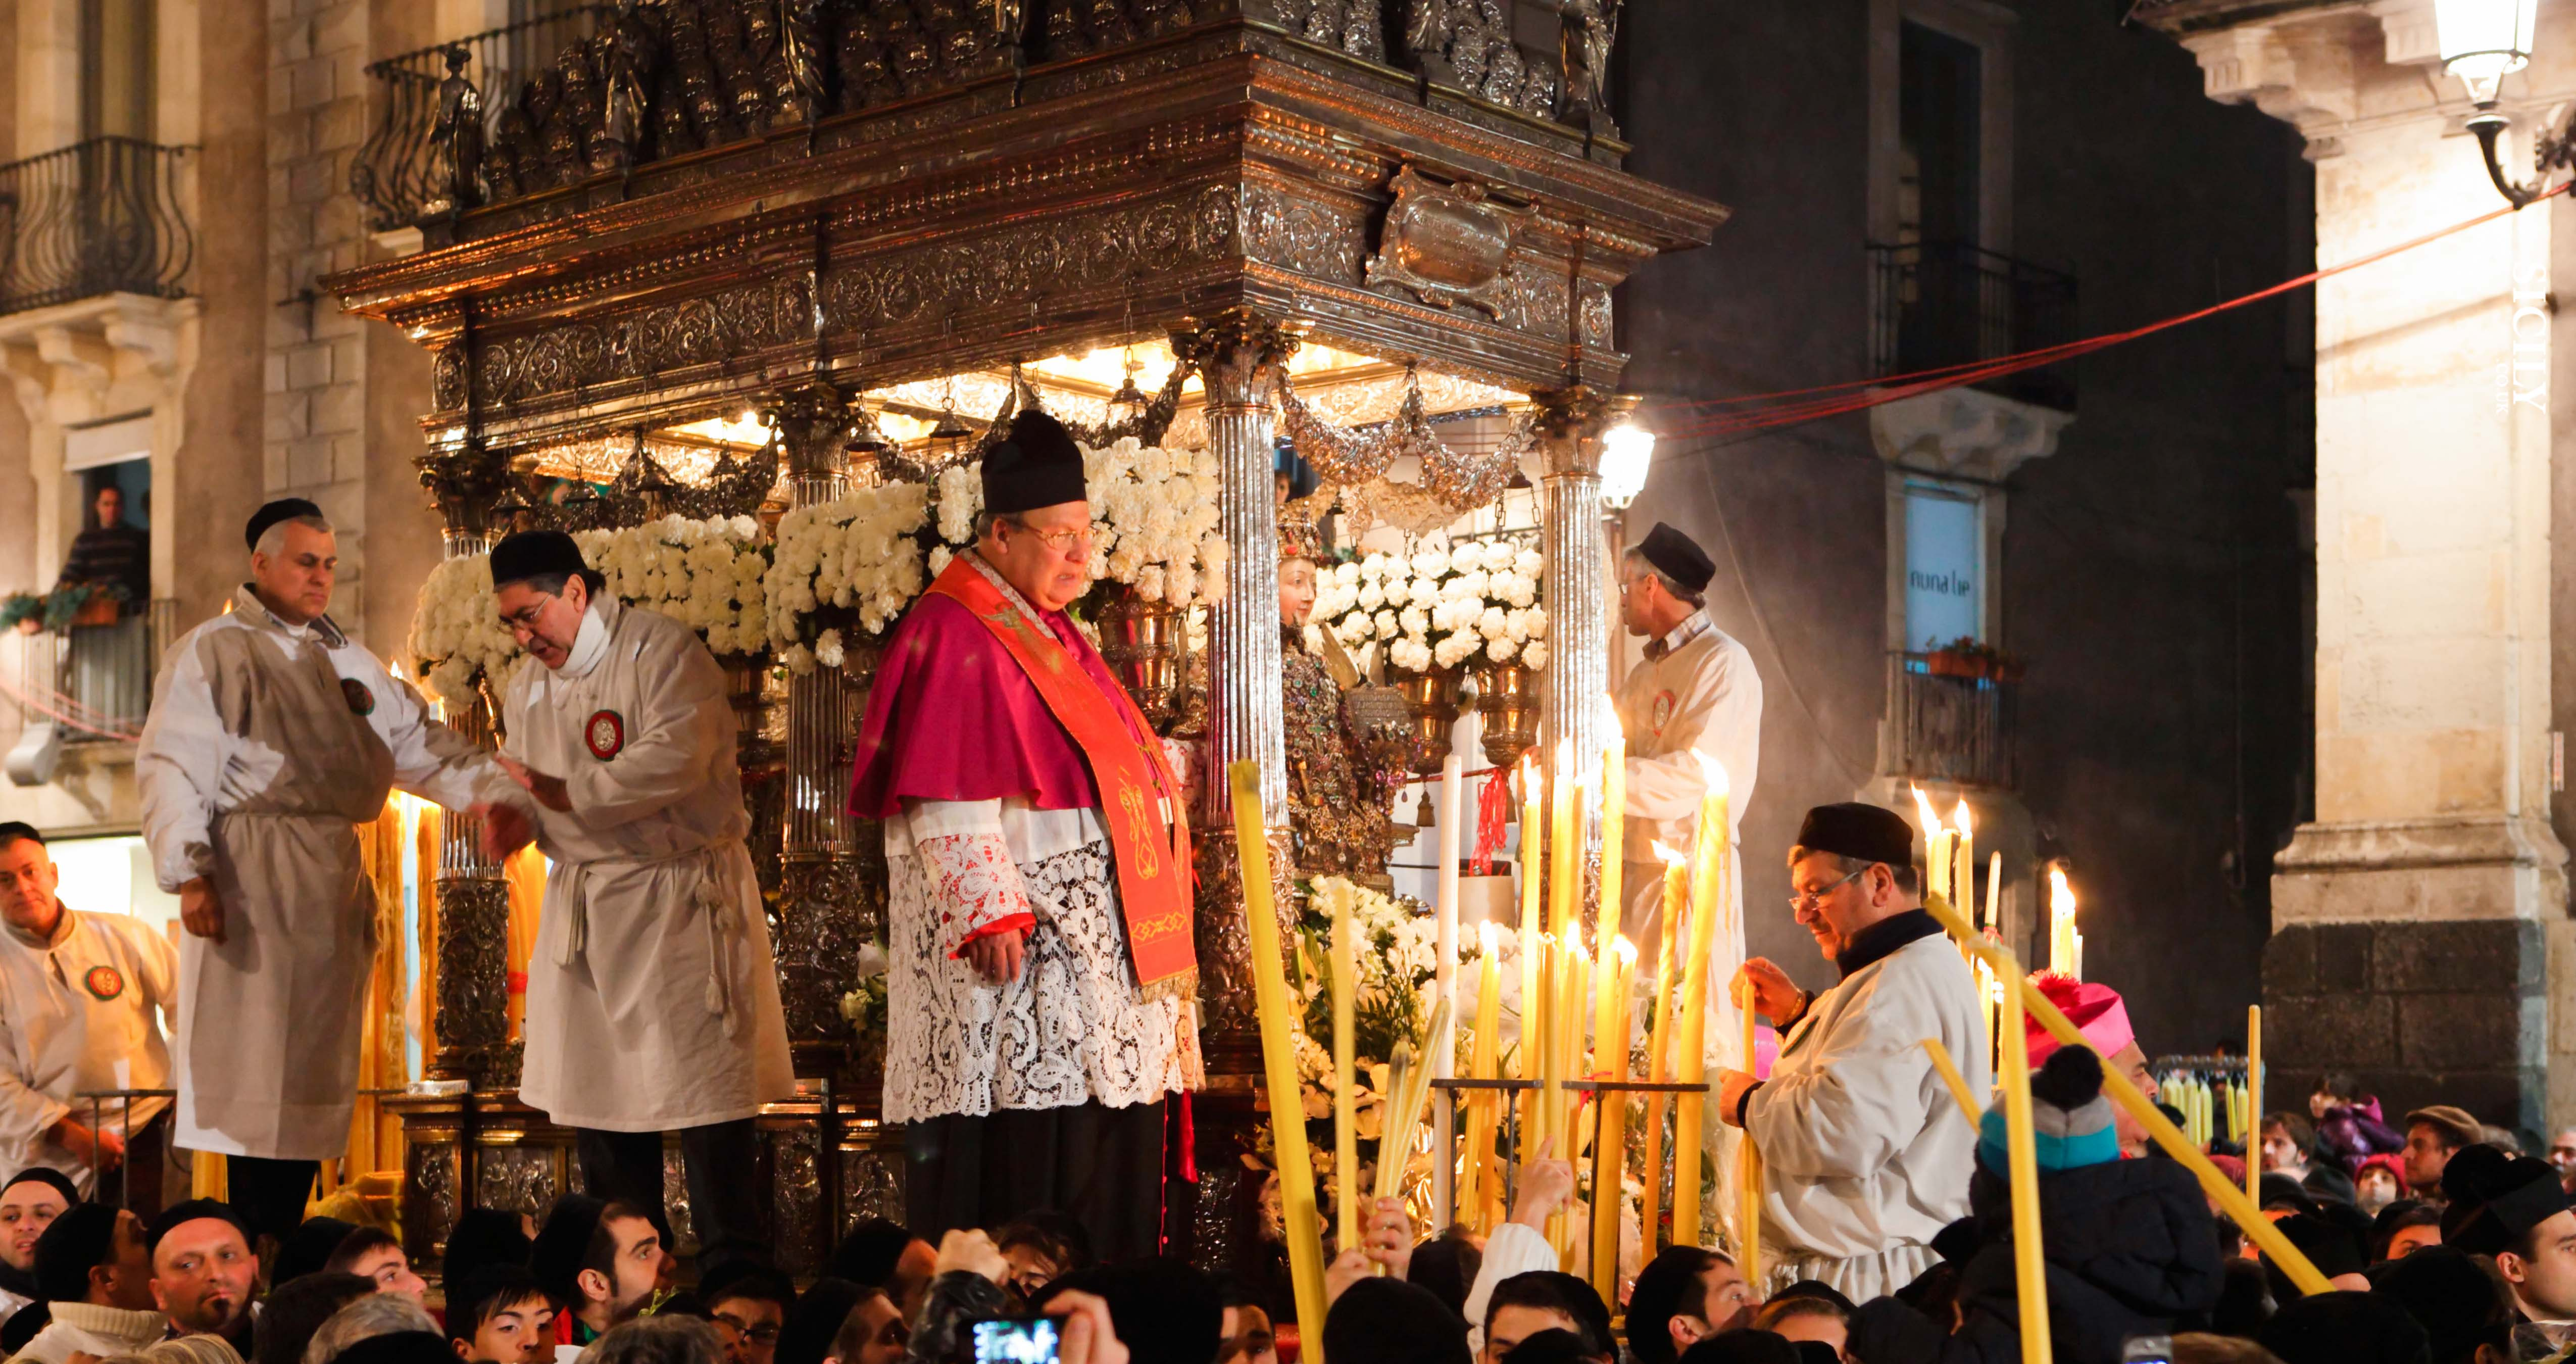 Festa di Sant'Agata (3-5/02)- The Festival of Sant'Agata - Sicily